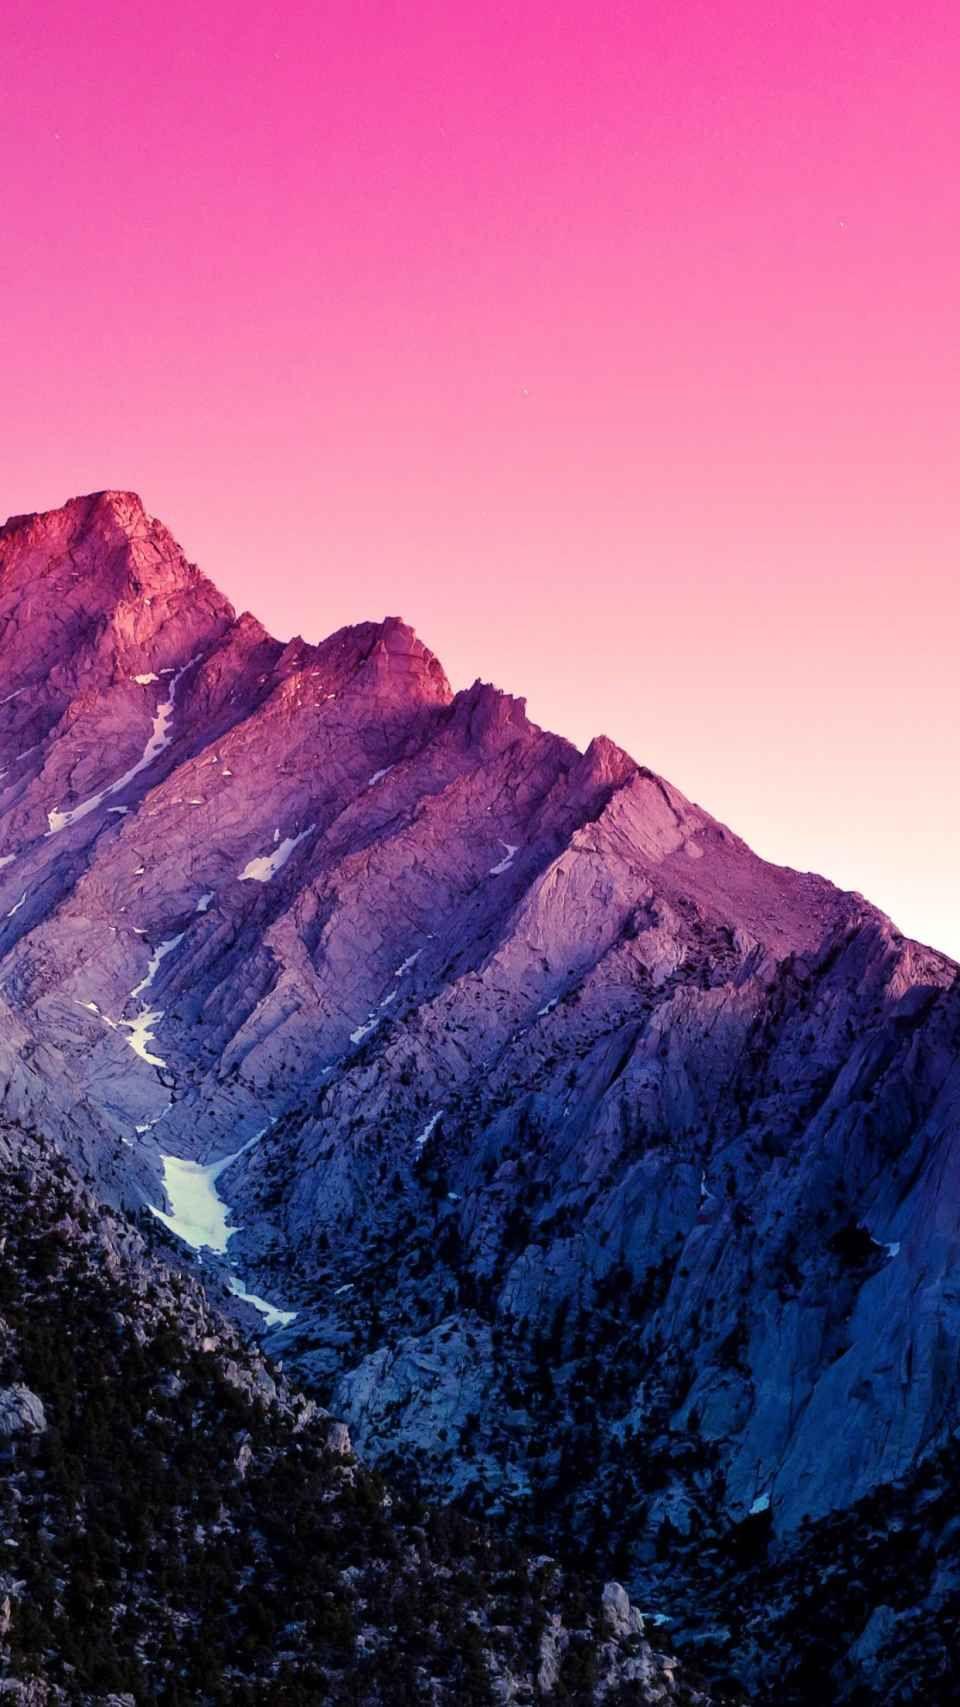 Best Wallpaper Mountain Pattern - ffbaba06f788cecdd9f2fb029e0d7d61  Snapshot_645176.jpg